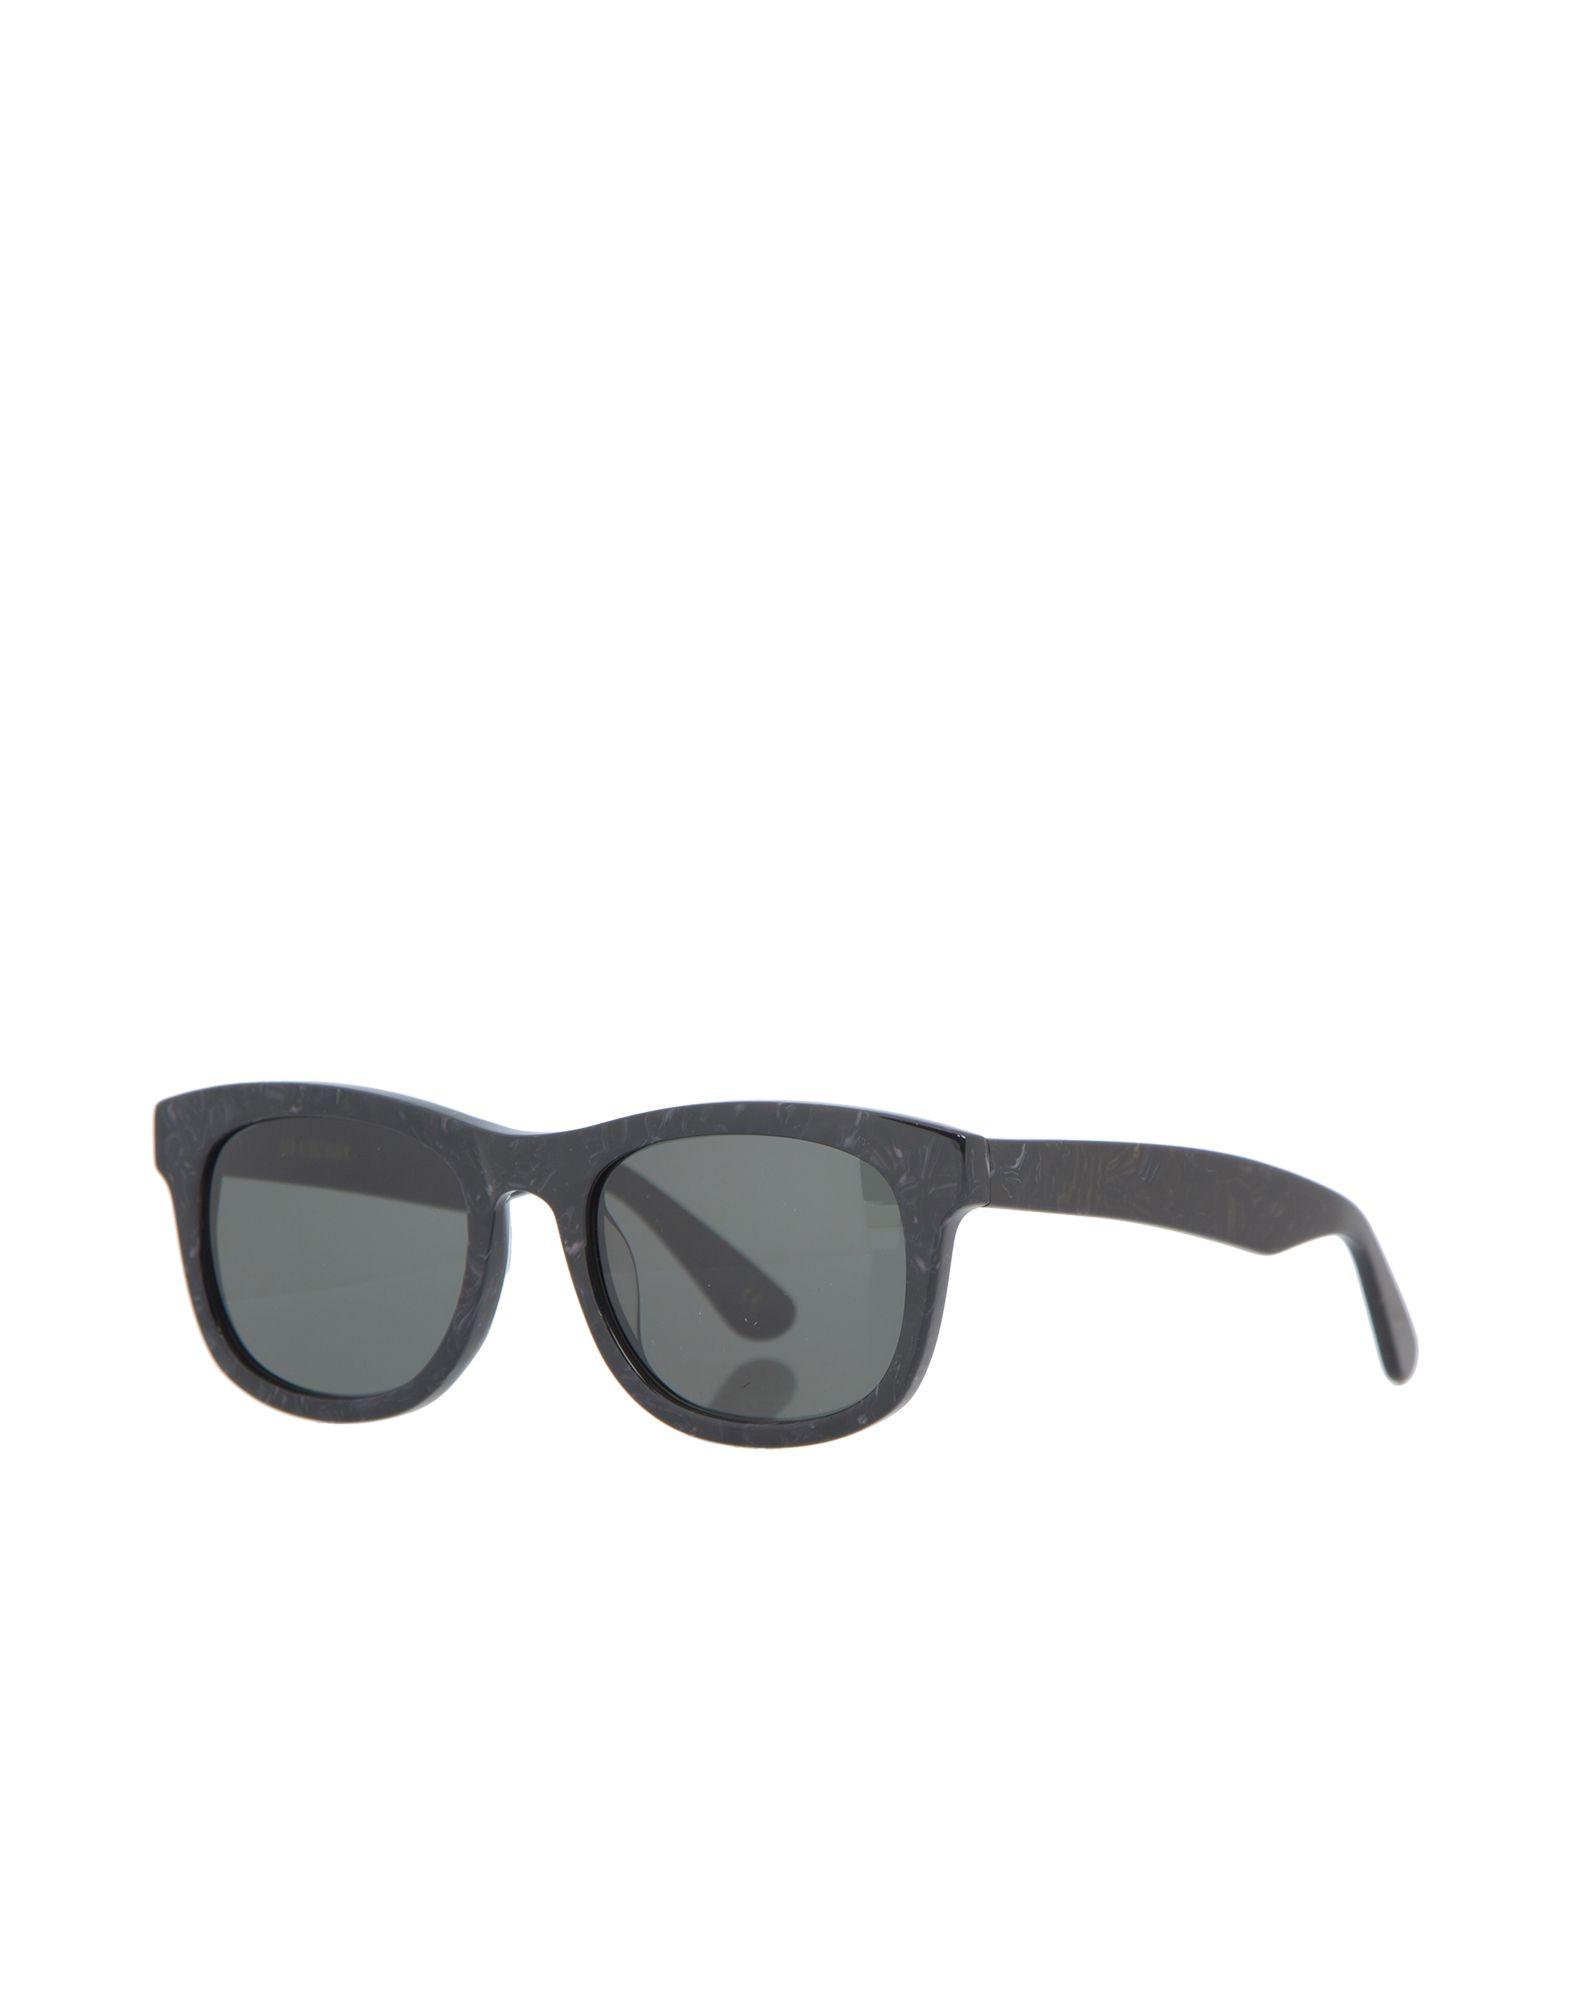 HAN KJØBENHAVN Солнечные очки han kjøbenhavn головной убор